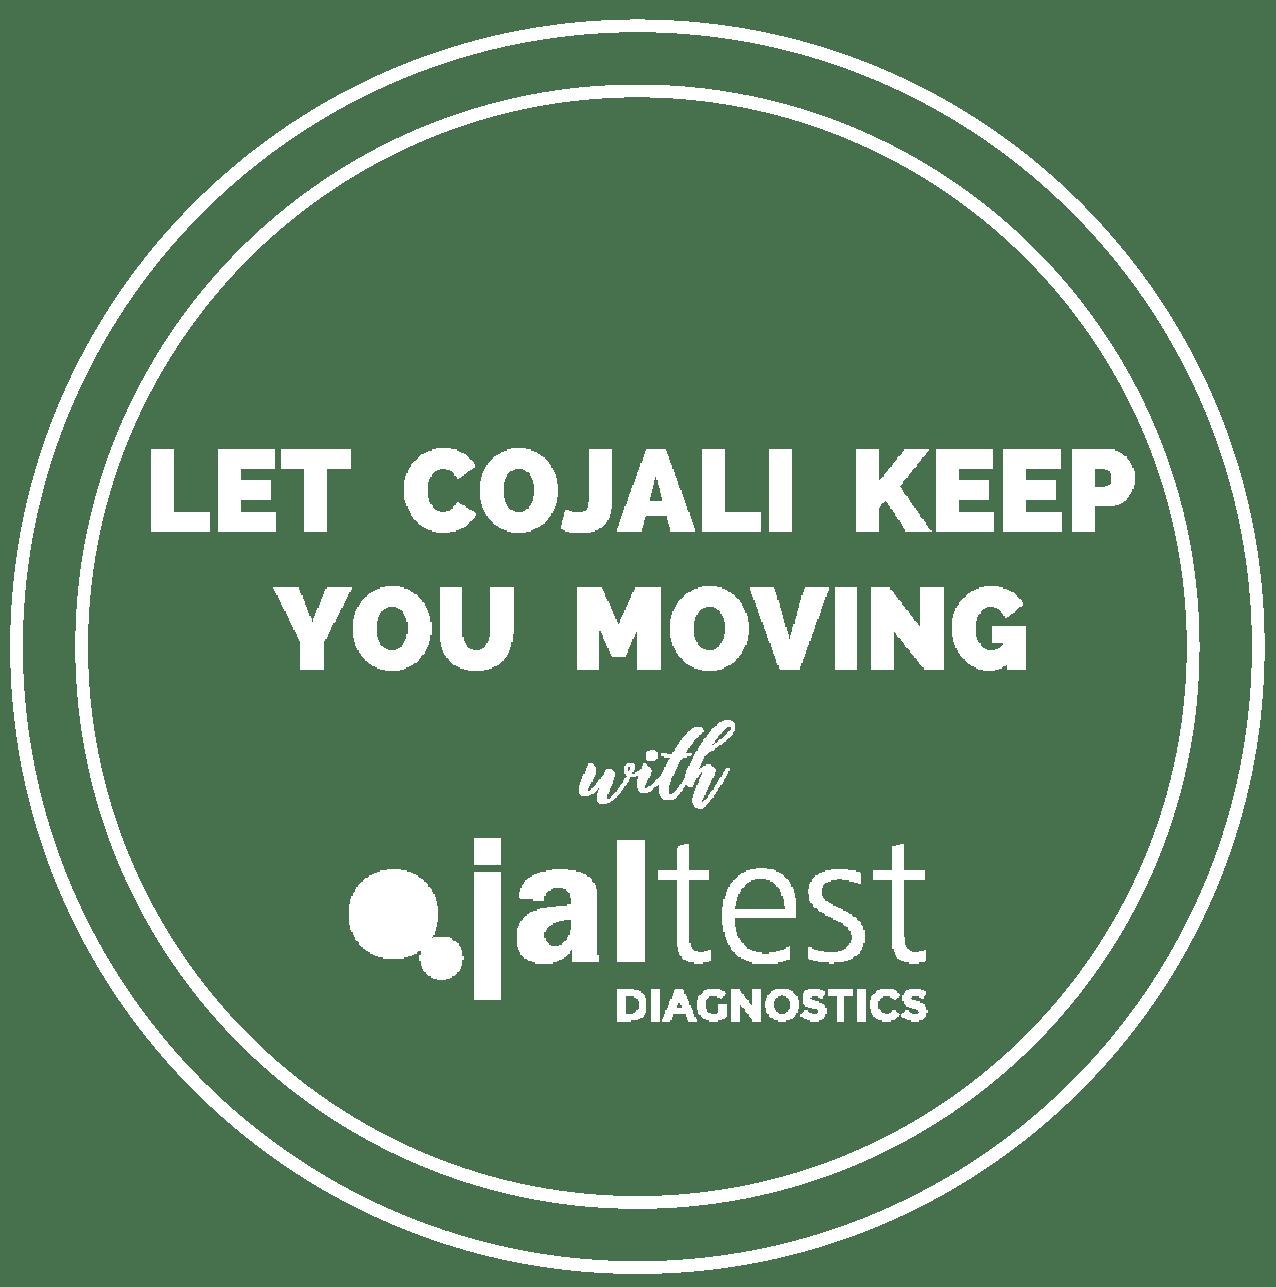 white cojali keep you moving graphic